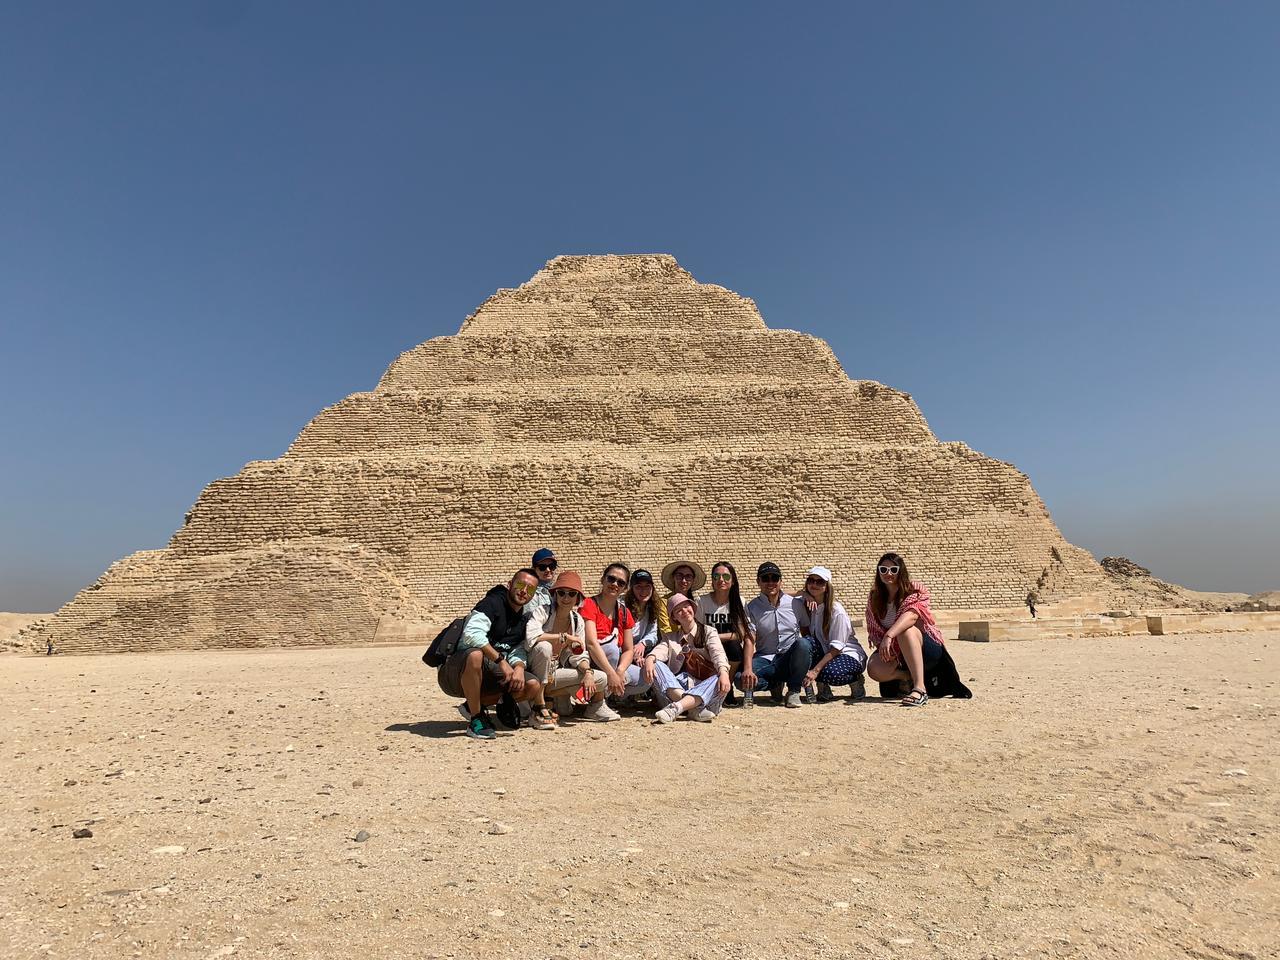 step pyramid, sakkara, saqqara, step pyramid of sakkara, djoser pyramid, pyramid of Djoser, Zoser pyramid